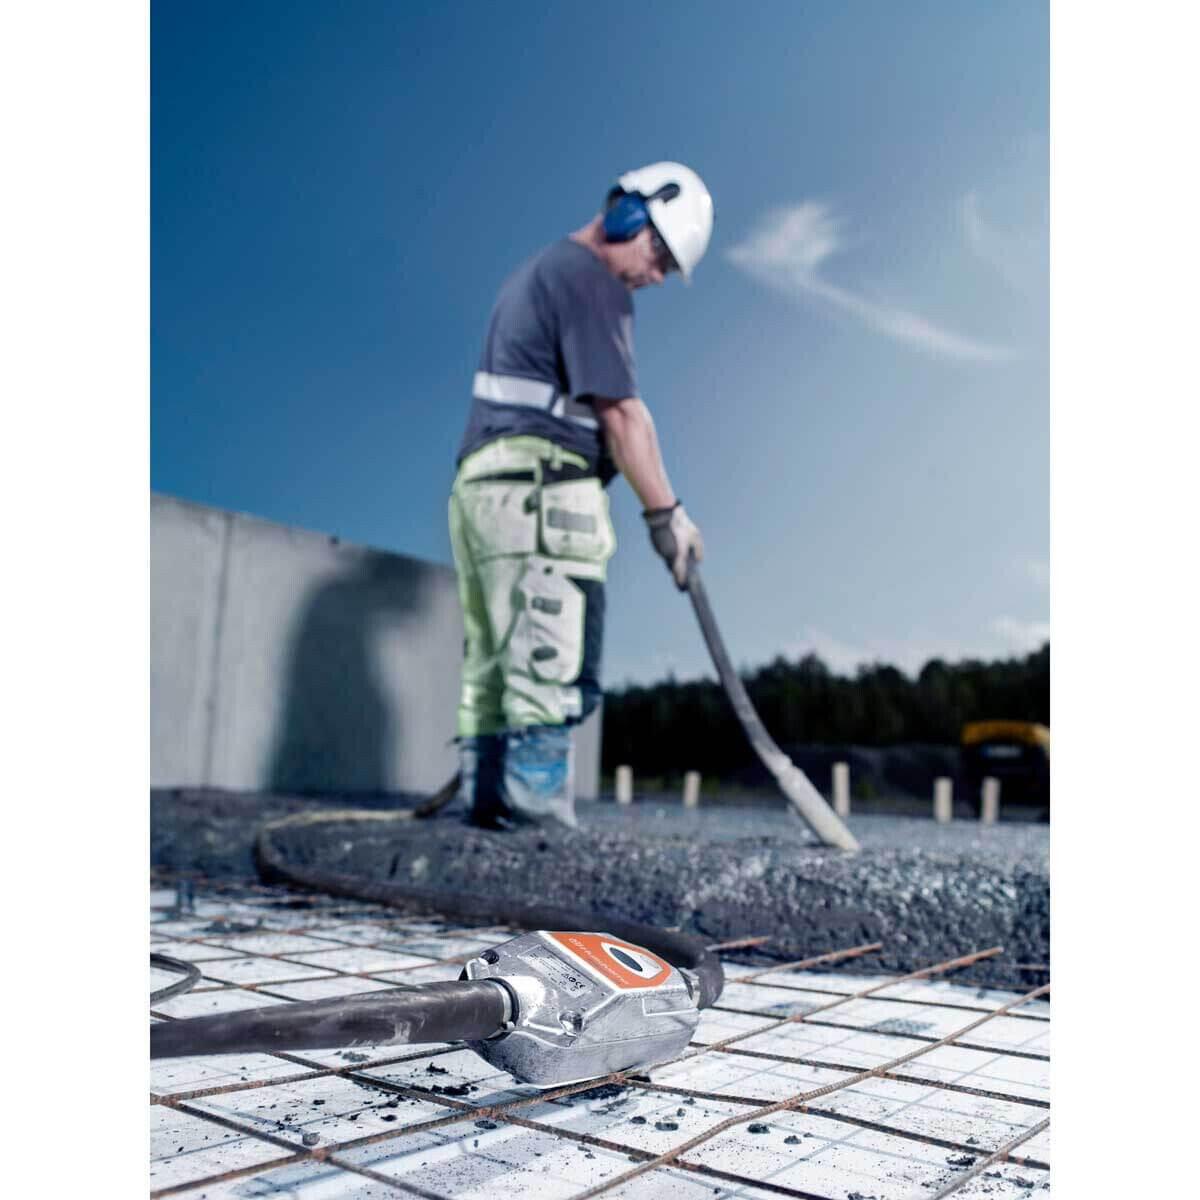 Husqvarna smart concrete vibrator in use on slab